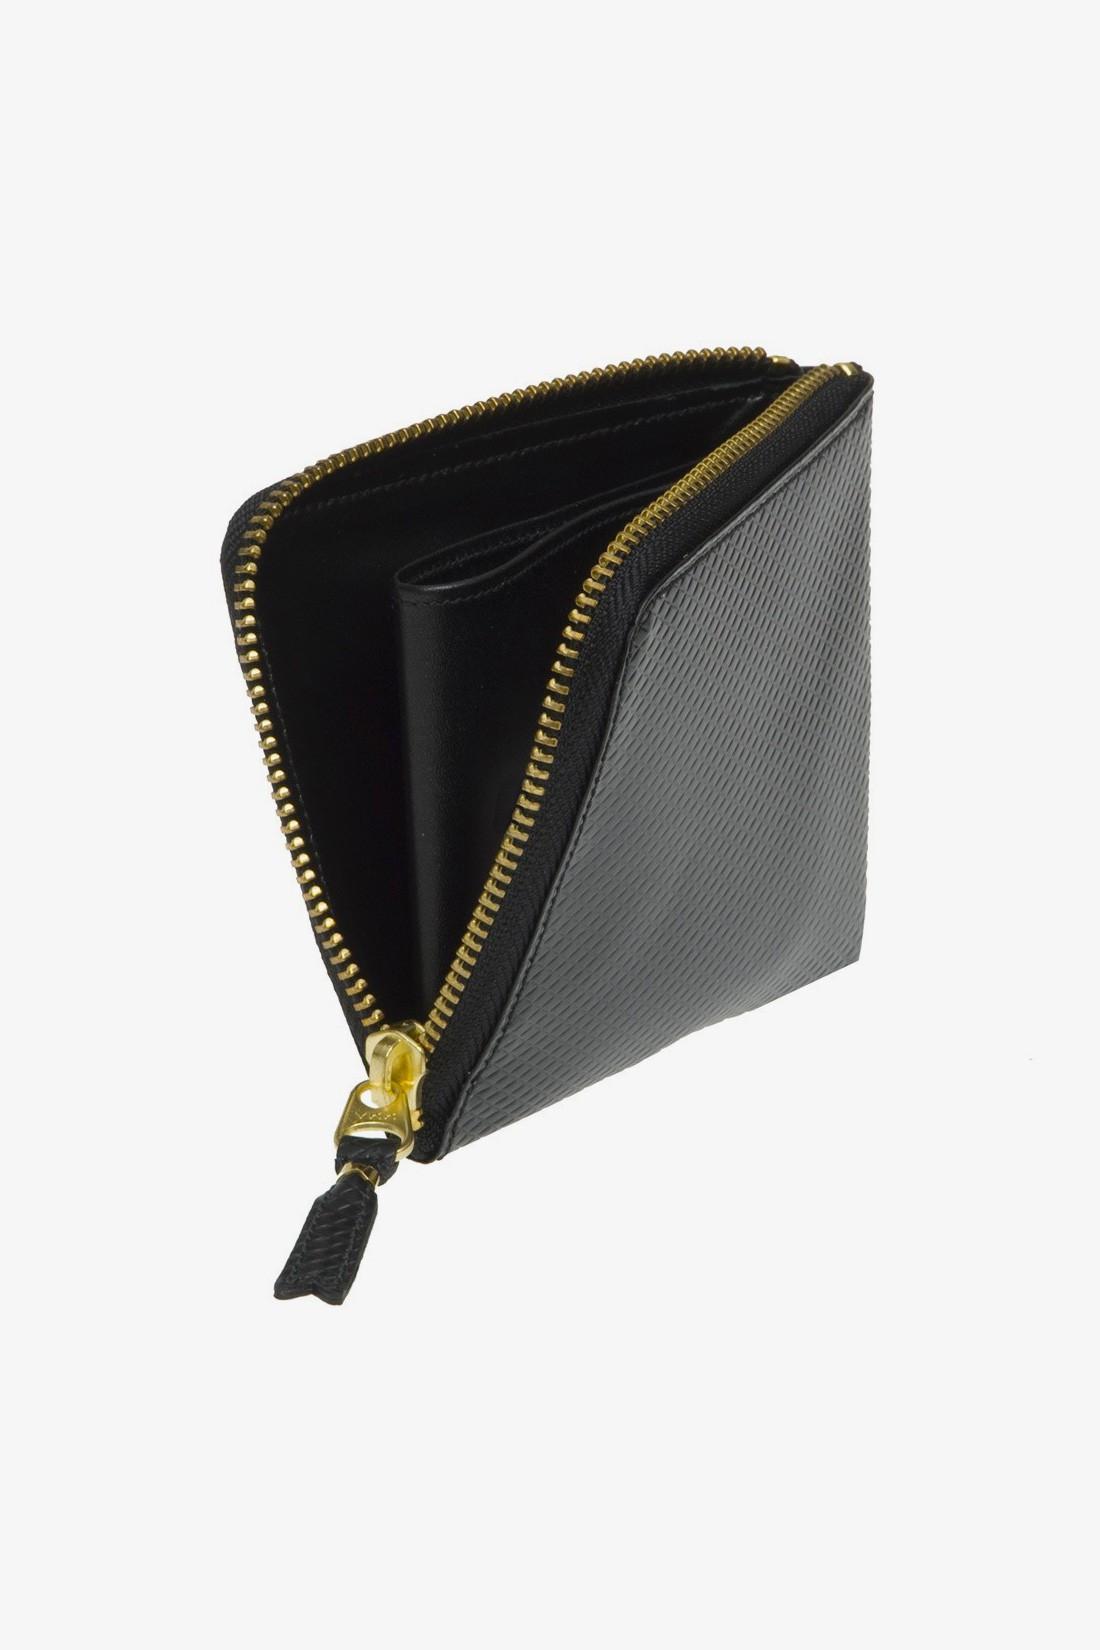 CDG WALLETS / Cdg luxury group 3100lg Black